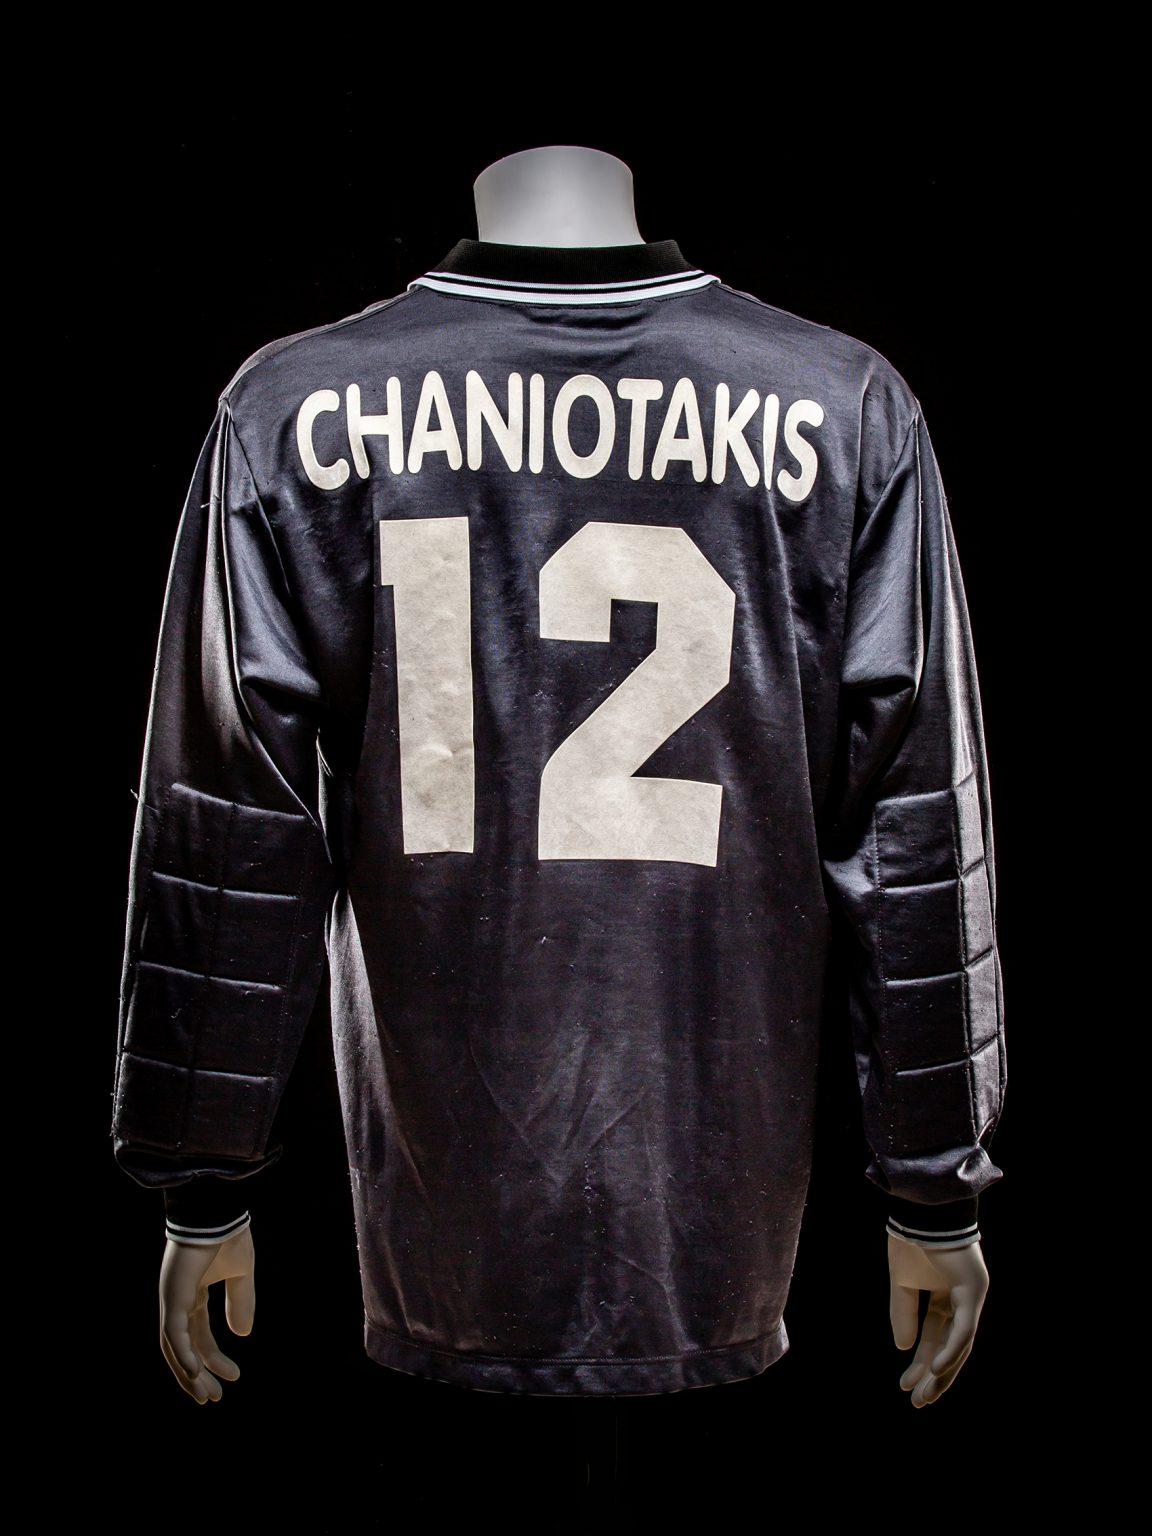 #12 Chaniotakis